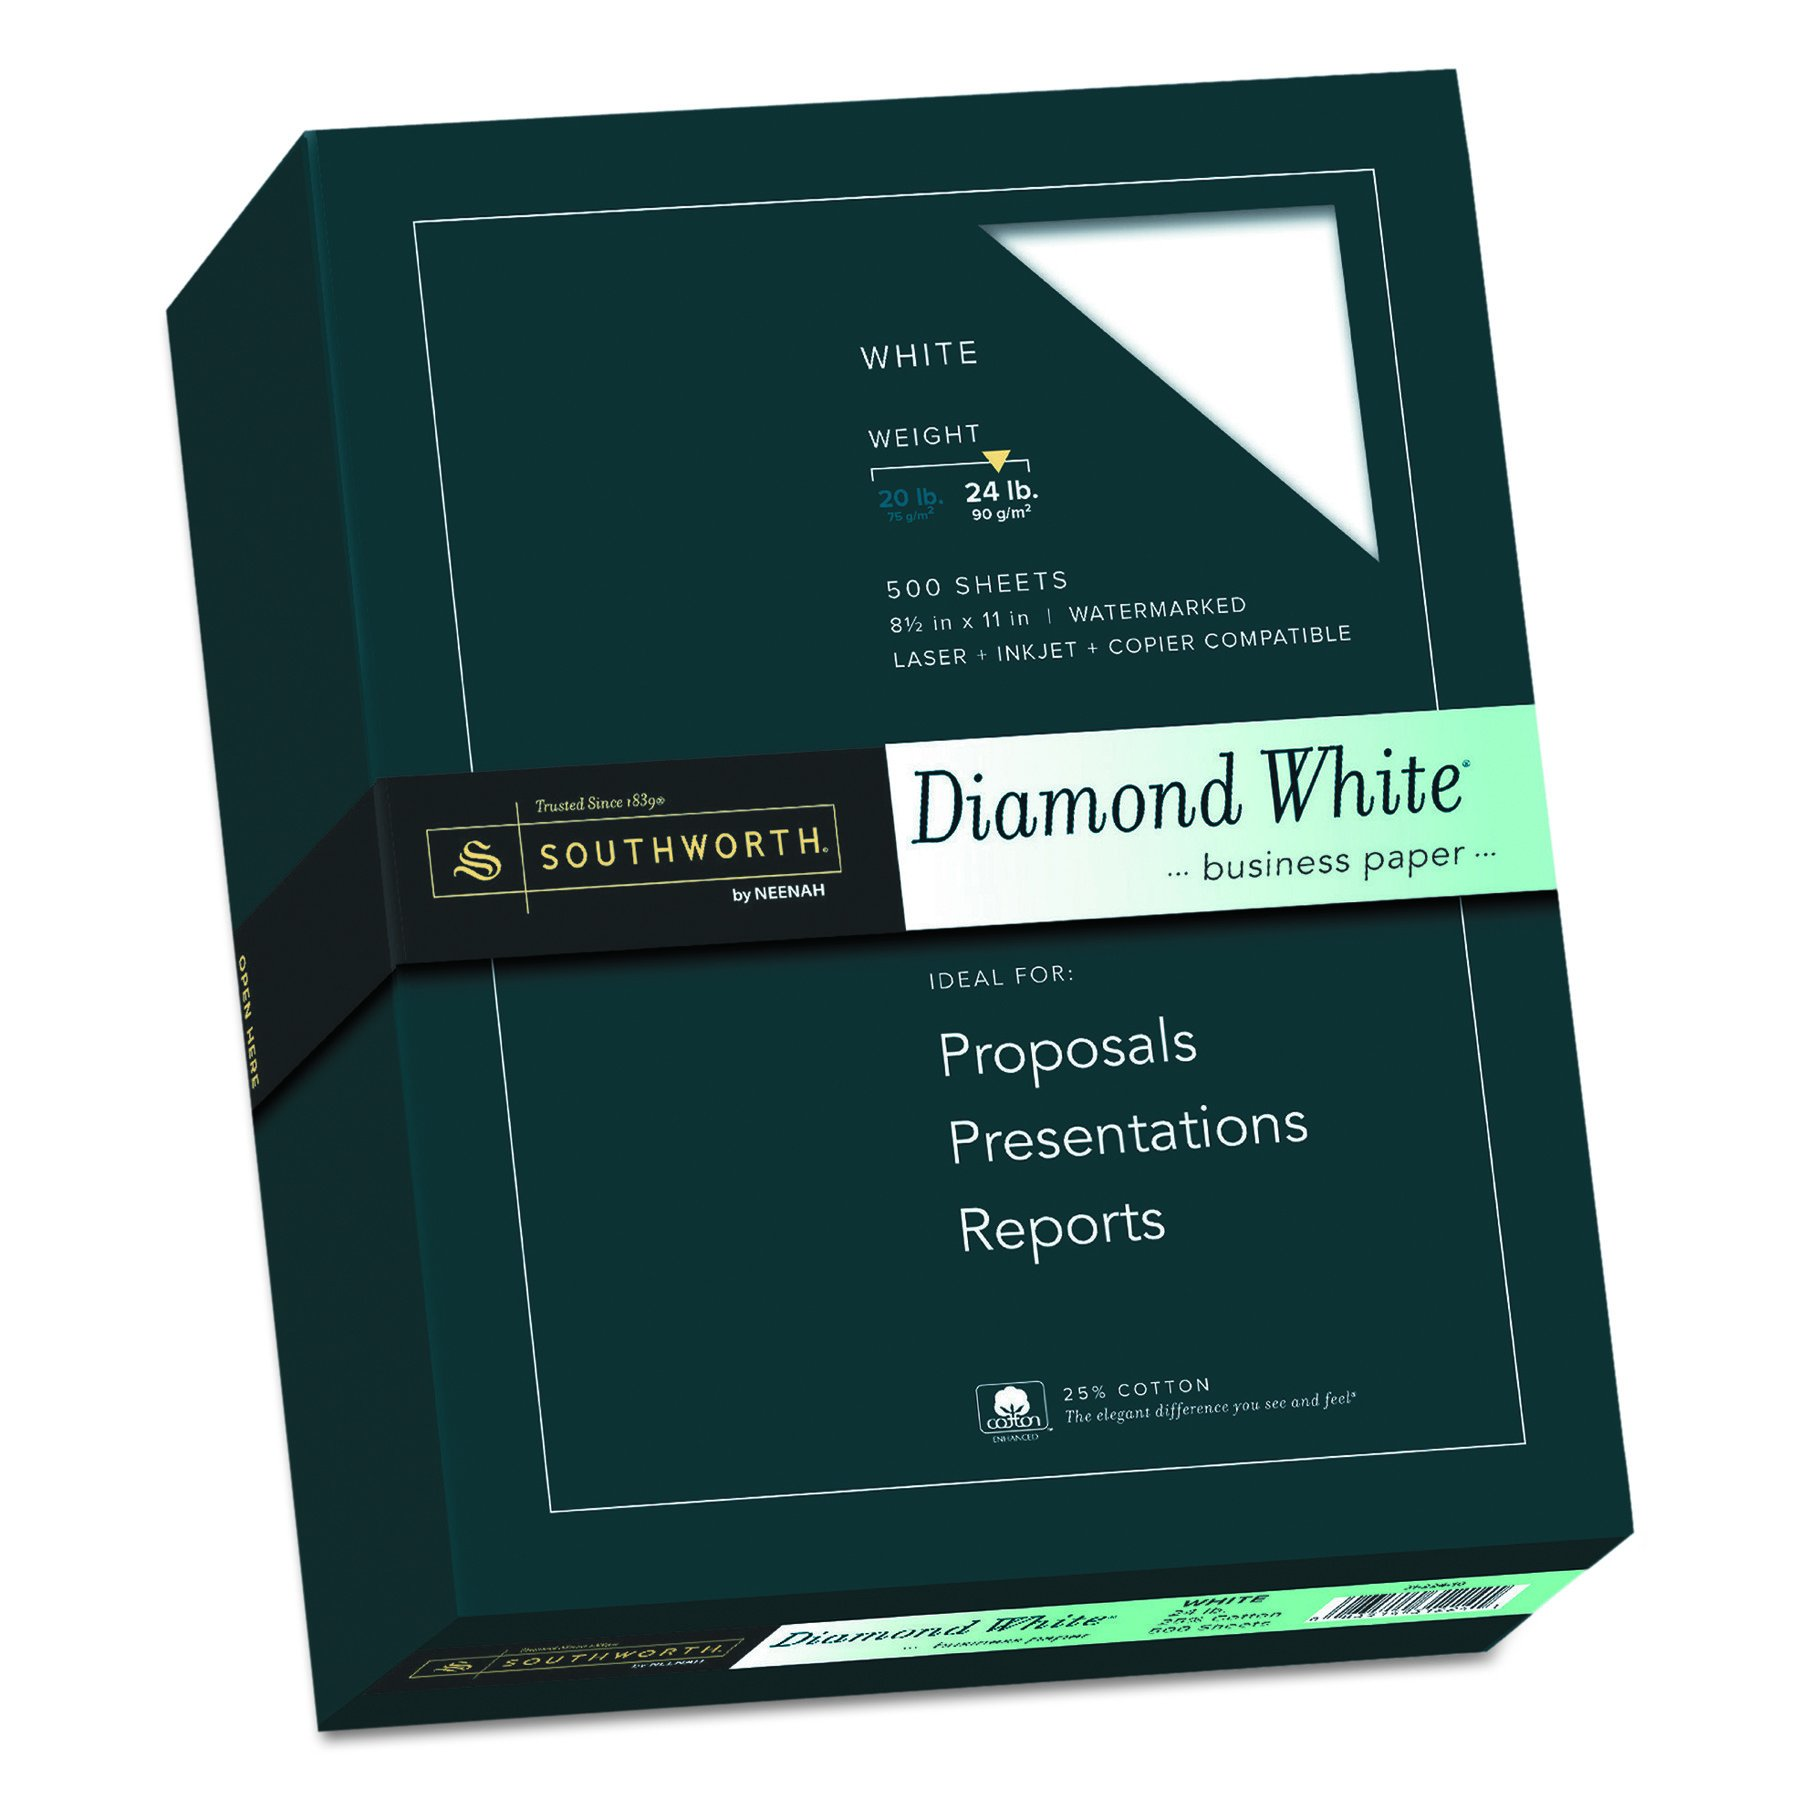 Southworth Diamond White Business Paper, White, 24 Pounds, 500 Count (31-224-10)